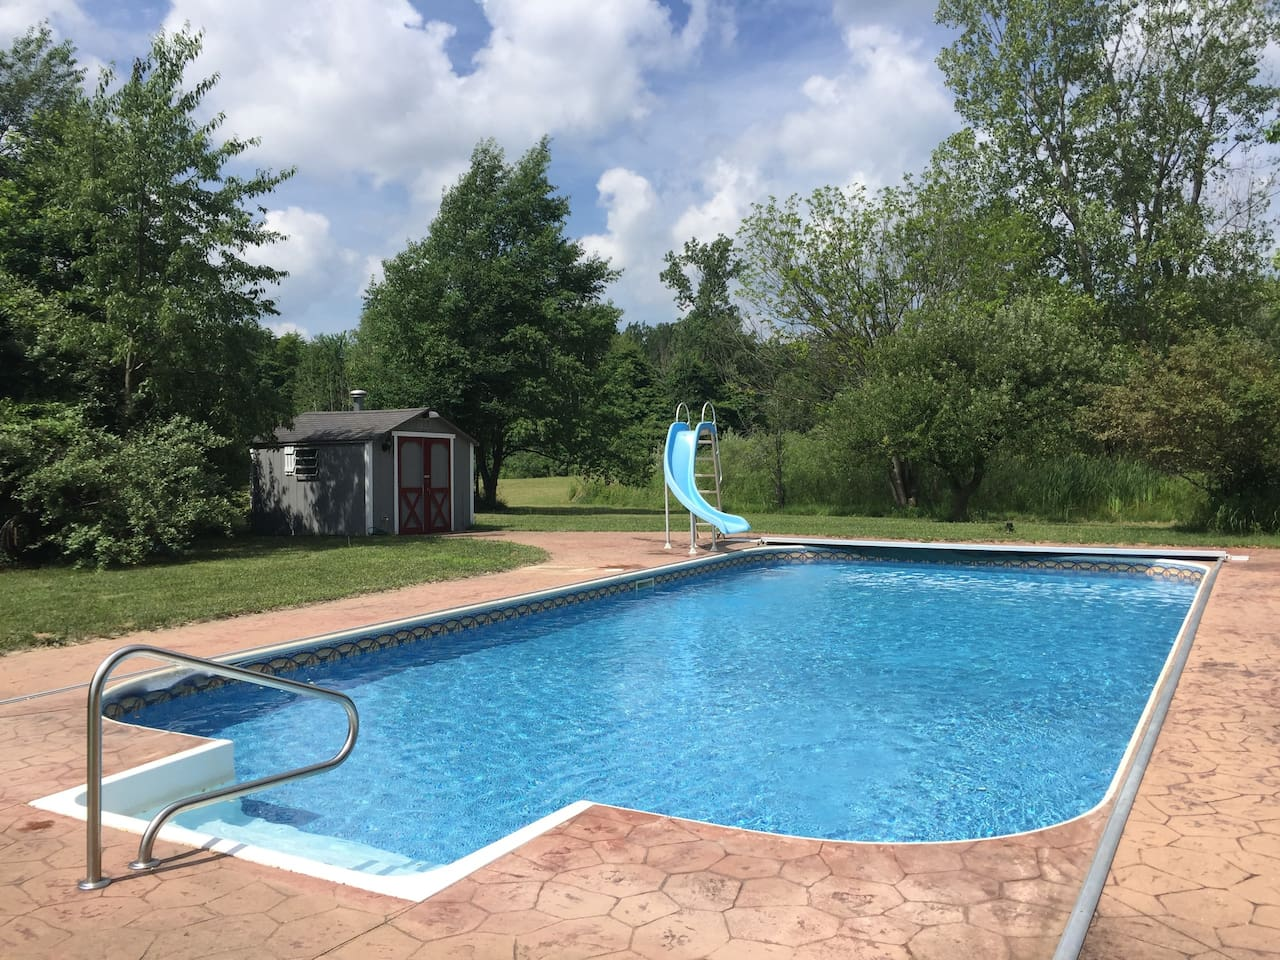 20'x40' Swimming Pool. Open daily 9 AM until nightfall.